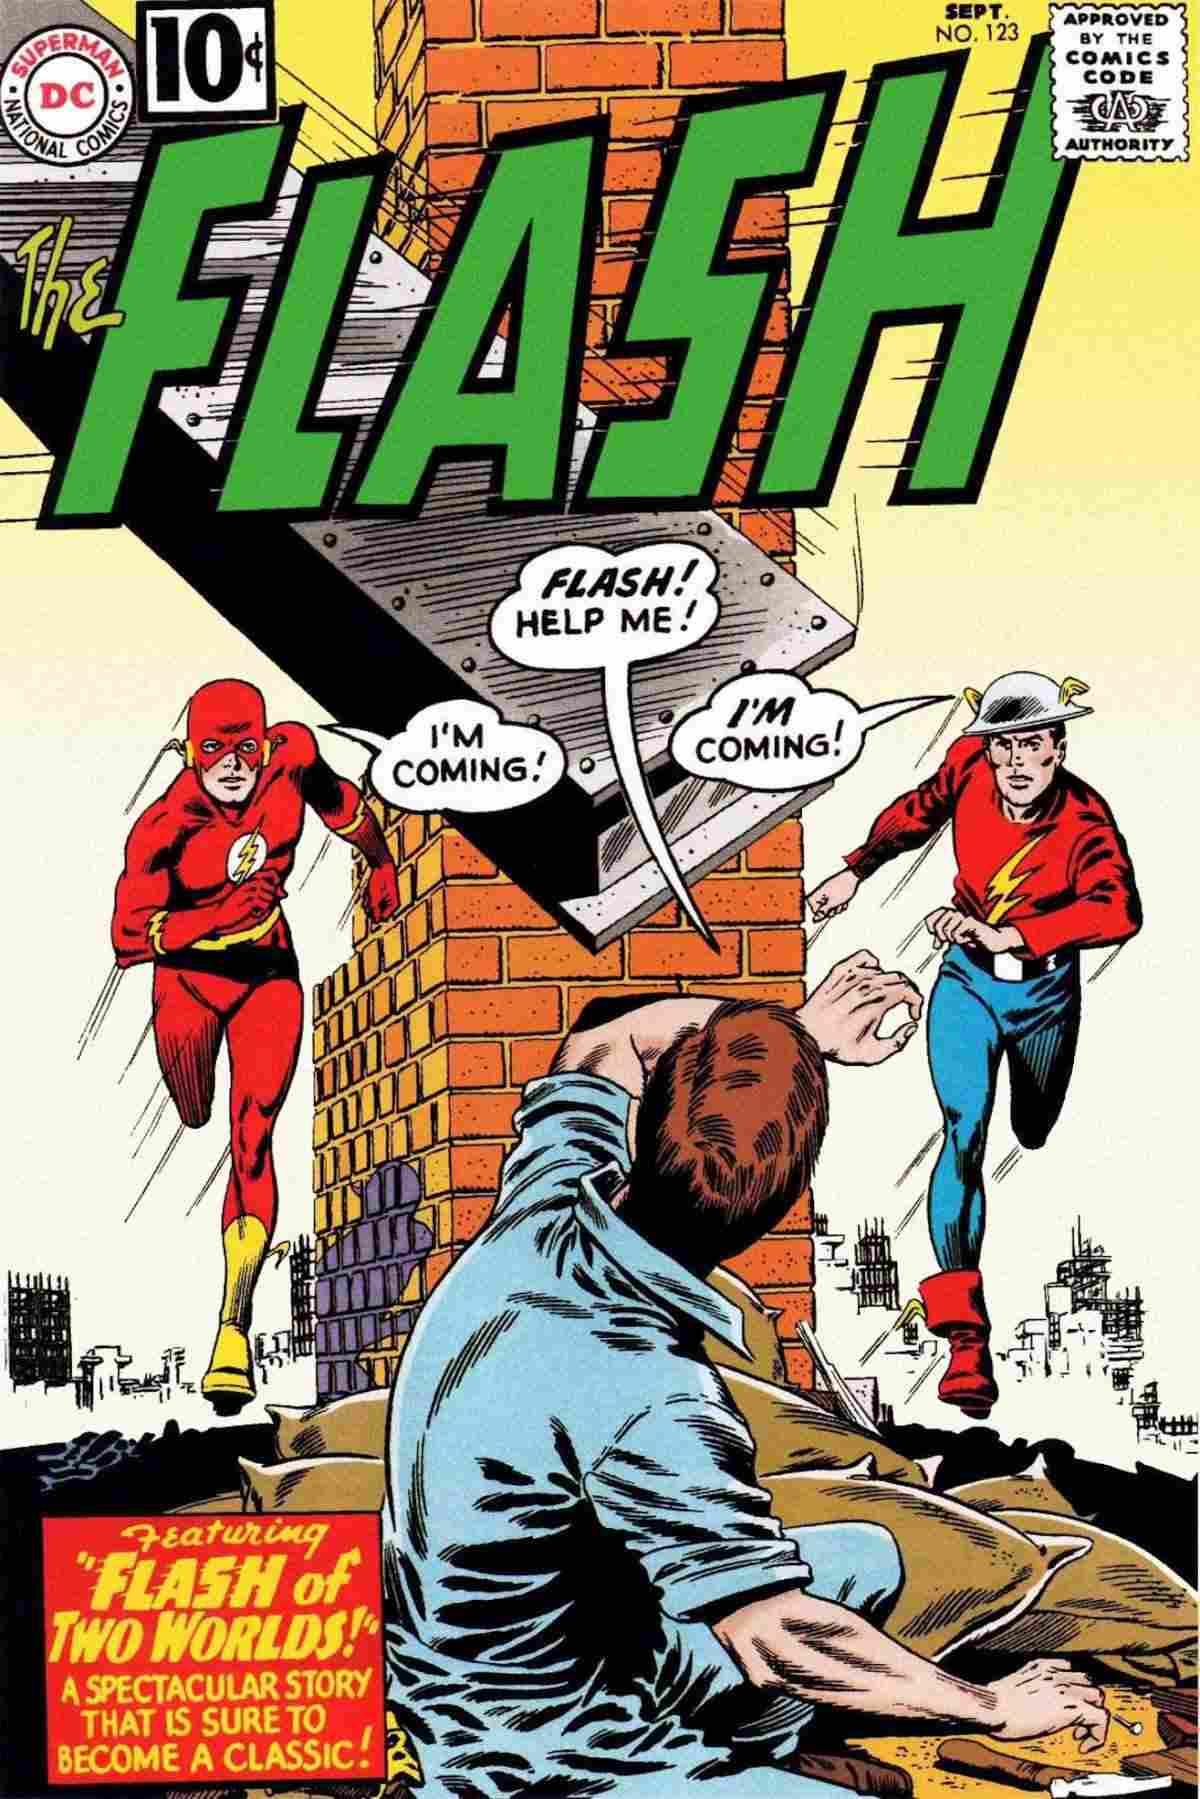 The Flash 123: el origen del multiverso DC